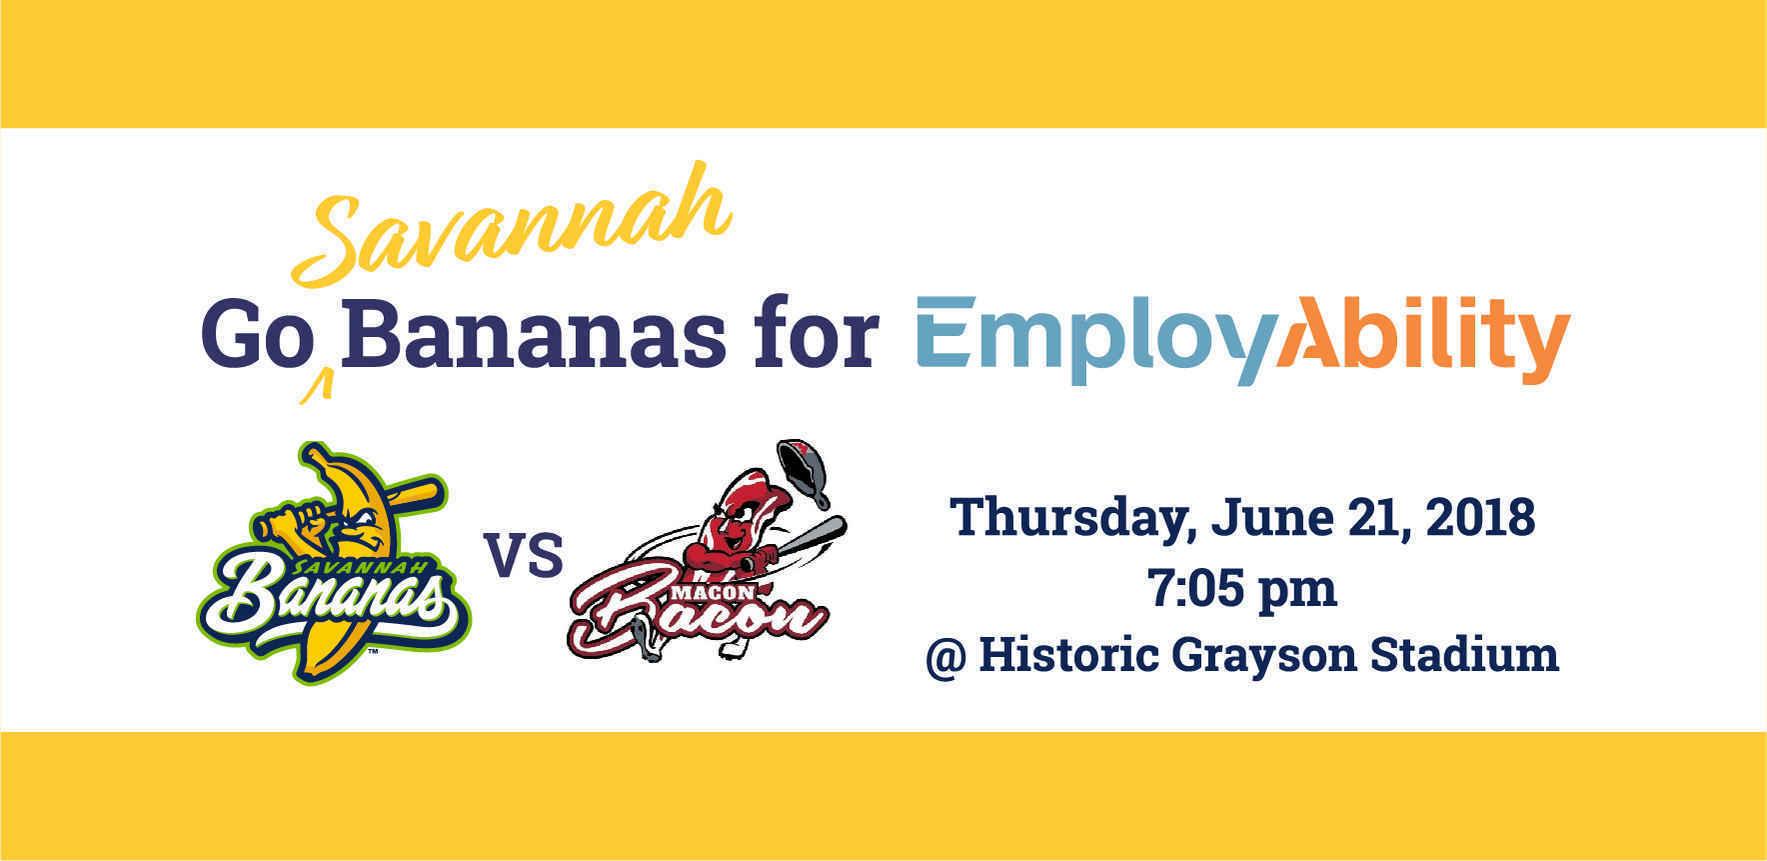 Go (Savannah) Bananas for EmployAbility! image